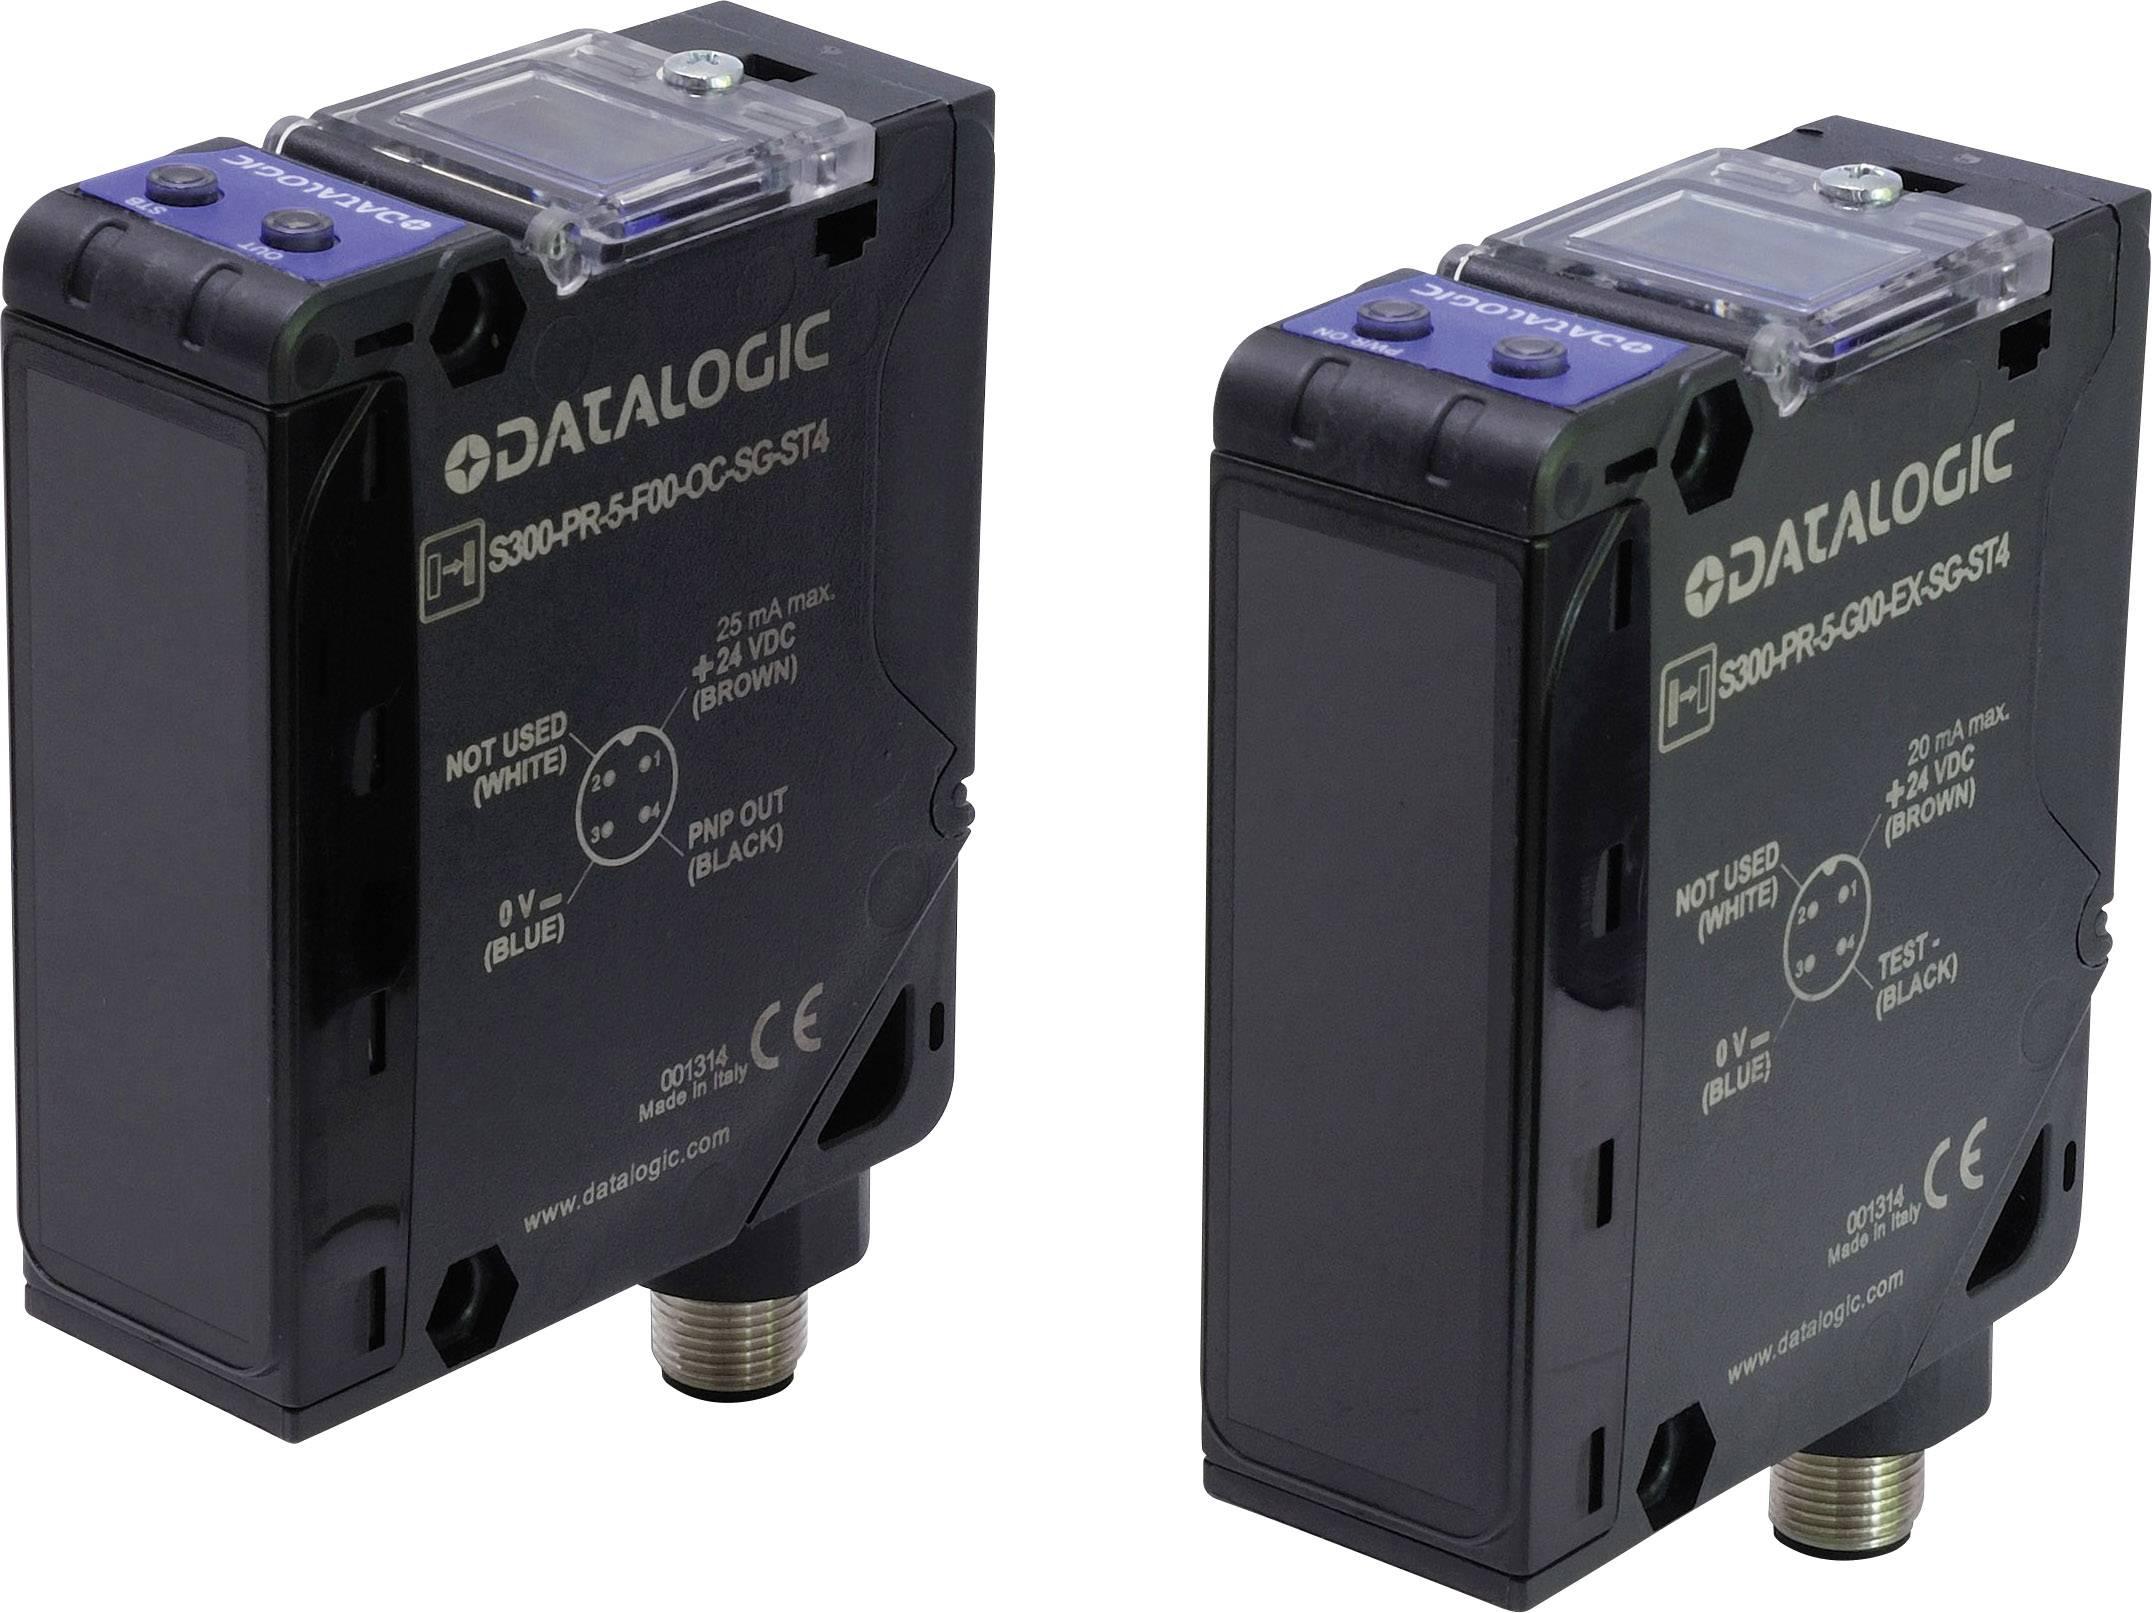 Reflexná svetelná závora DataLogic S300-PR-1-F01-RX 951451250, max. dosah 60 m